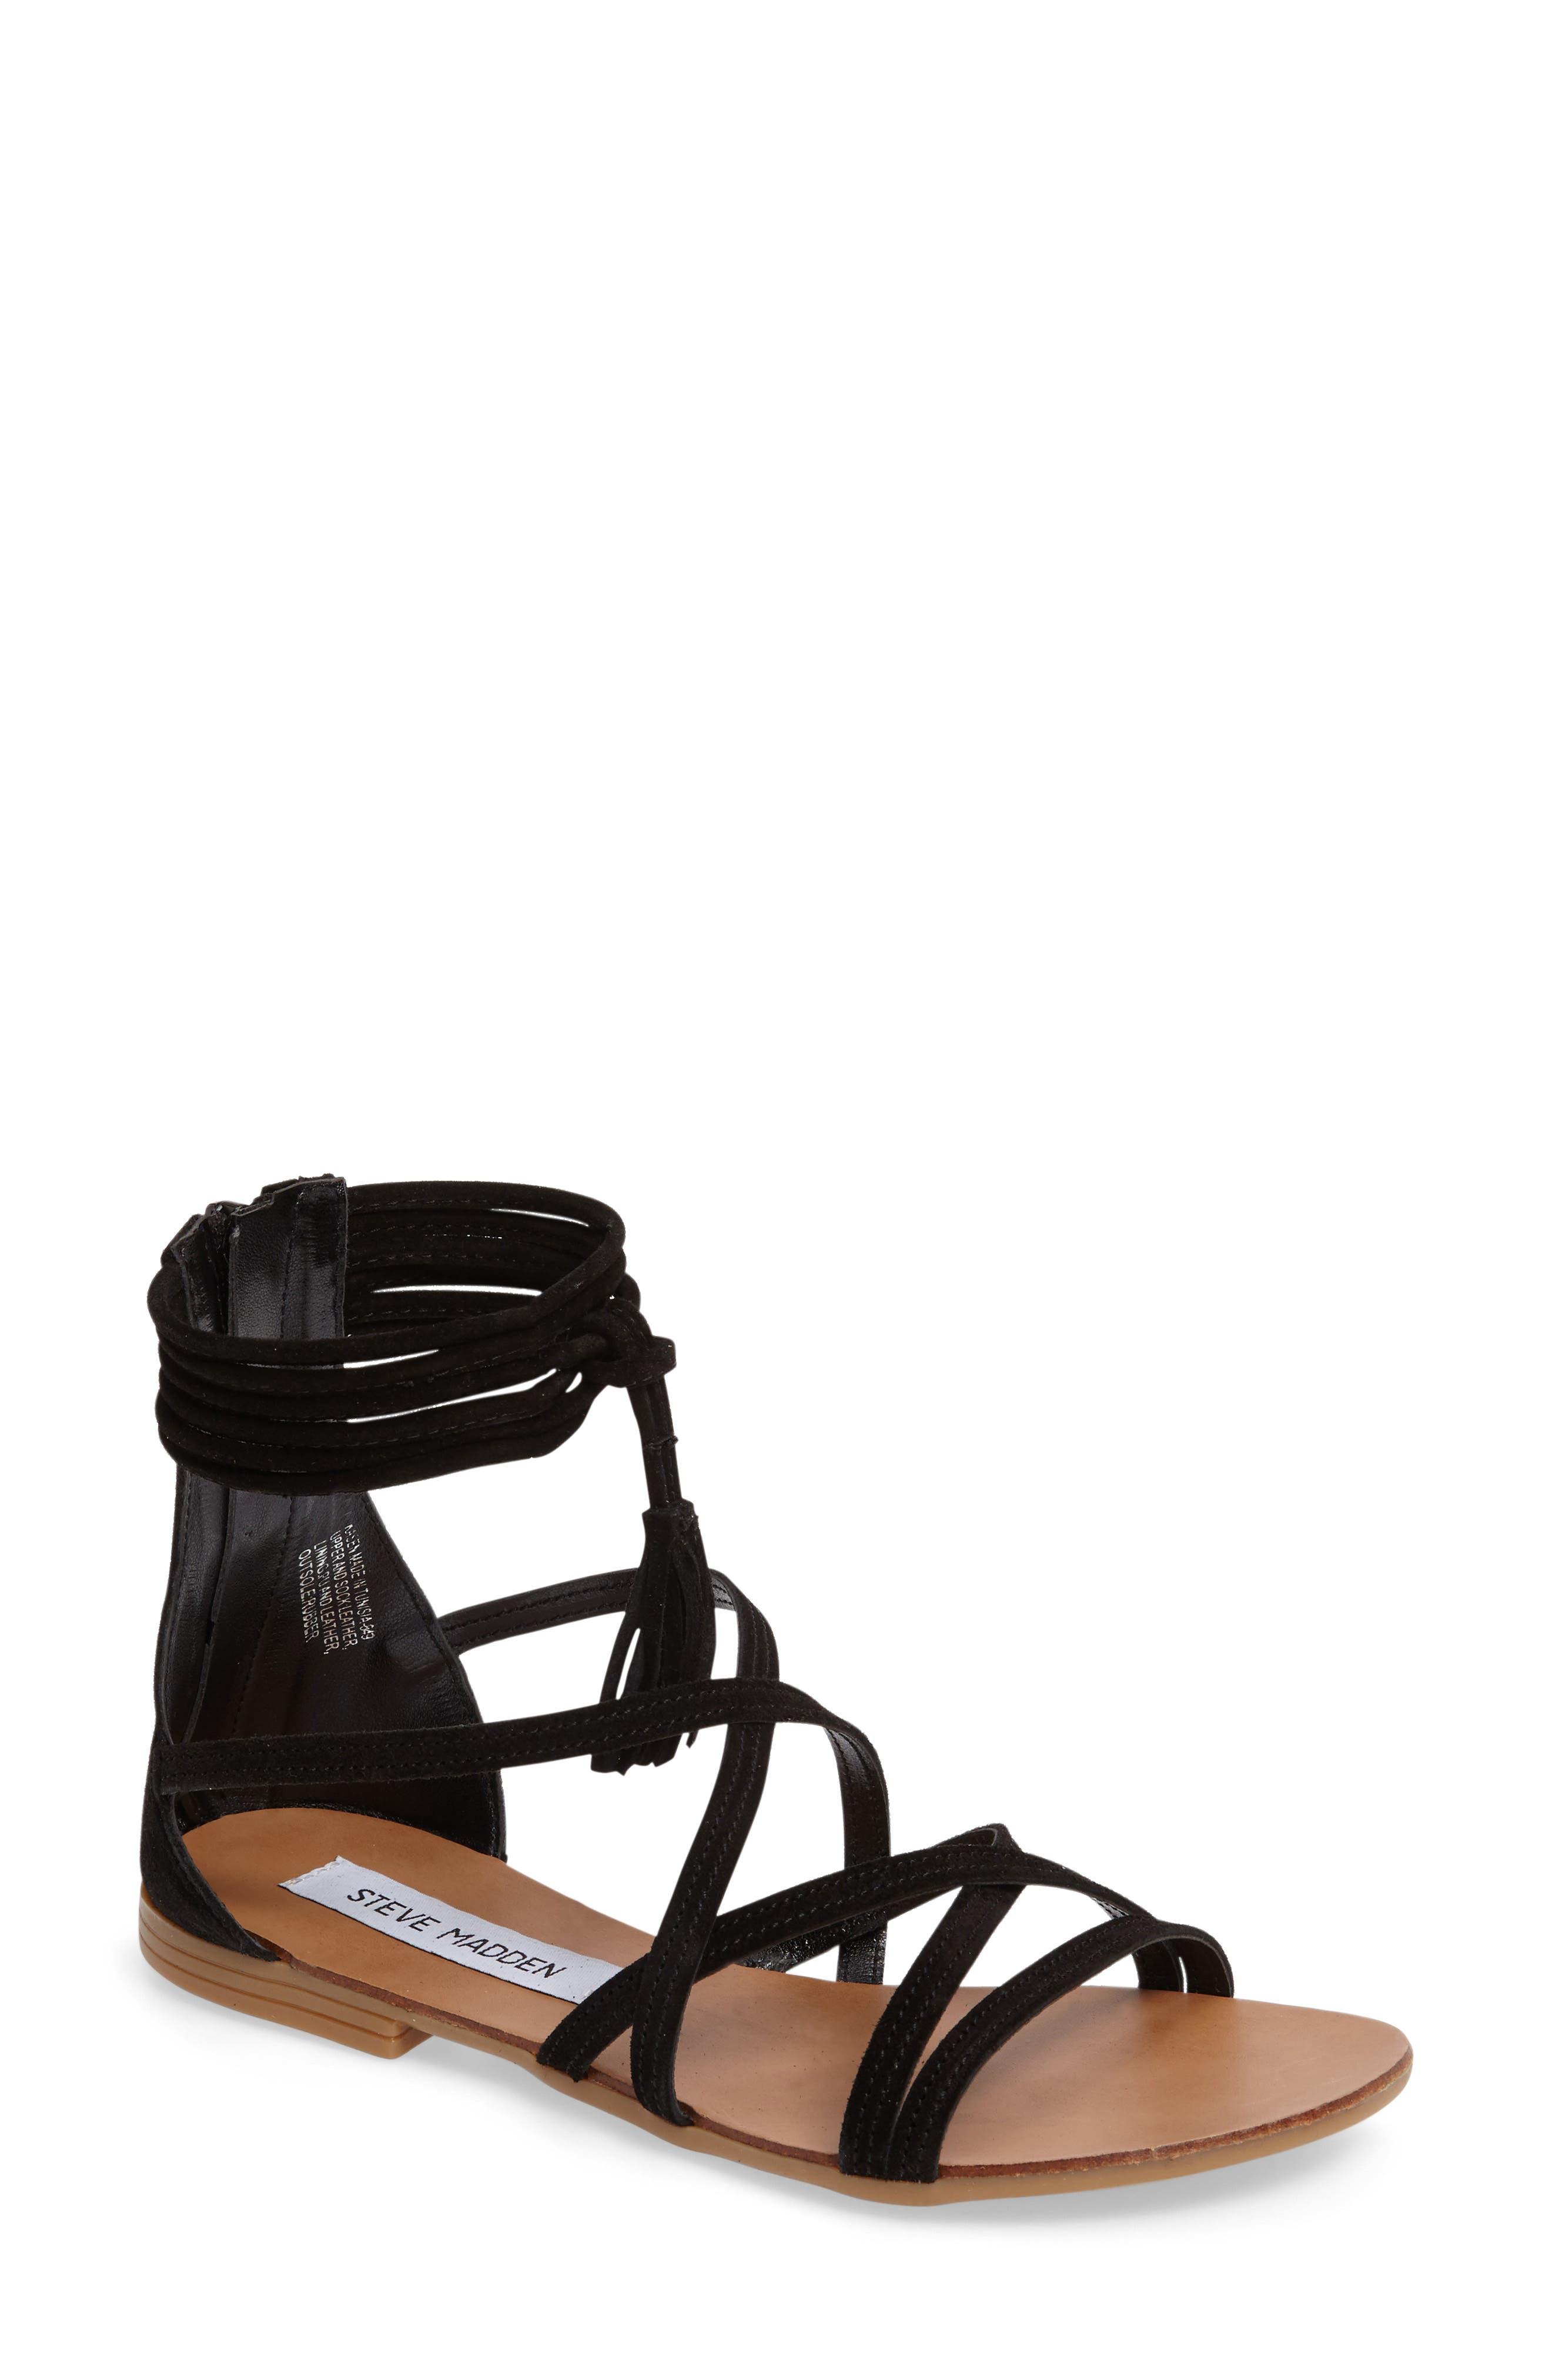 Kasen Sandal,                         Main,                         color, 006